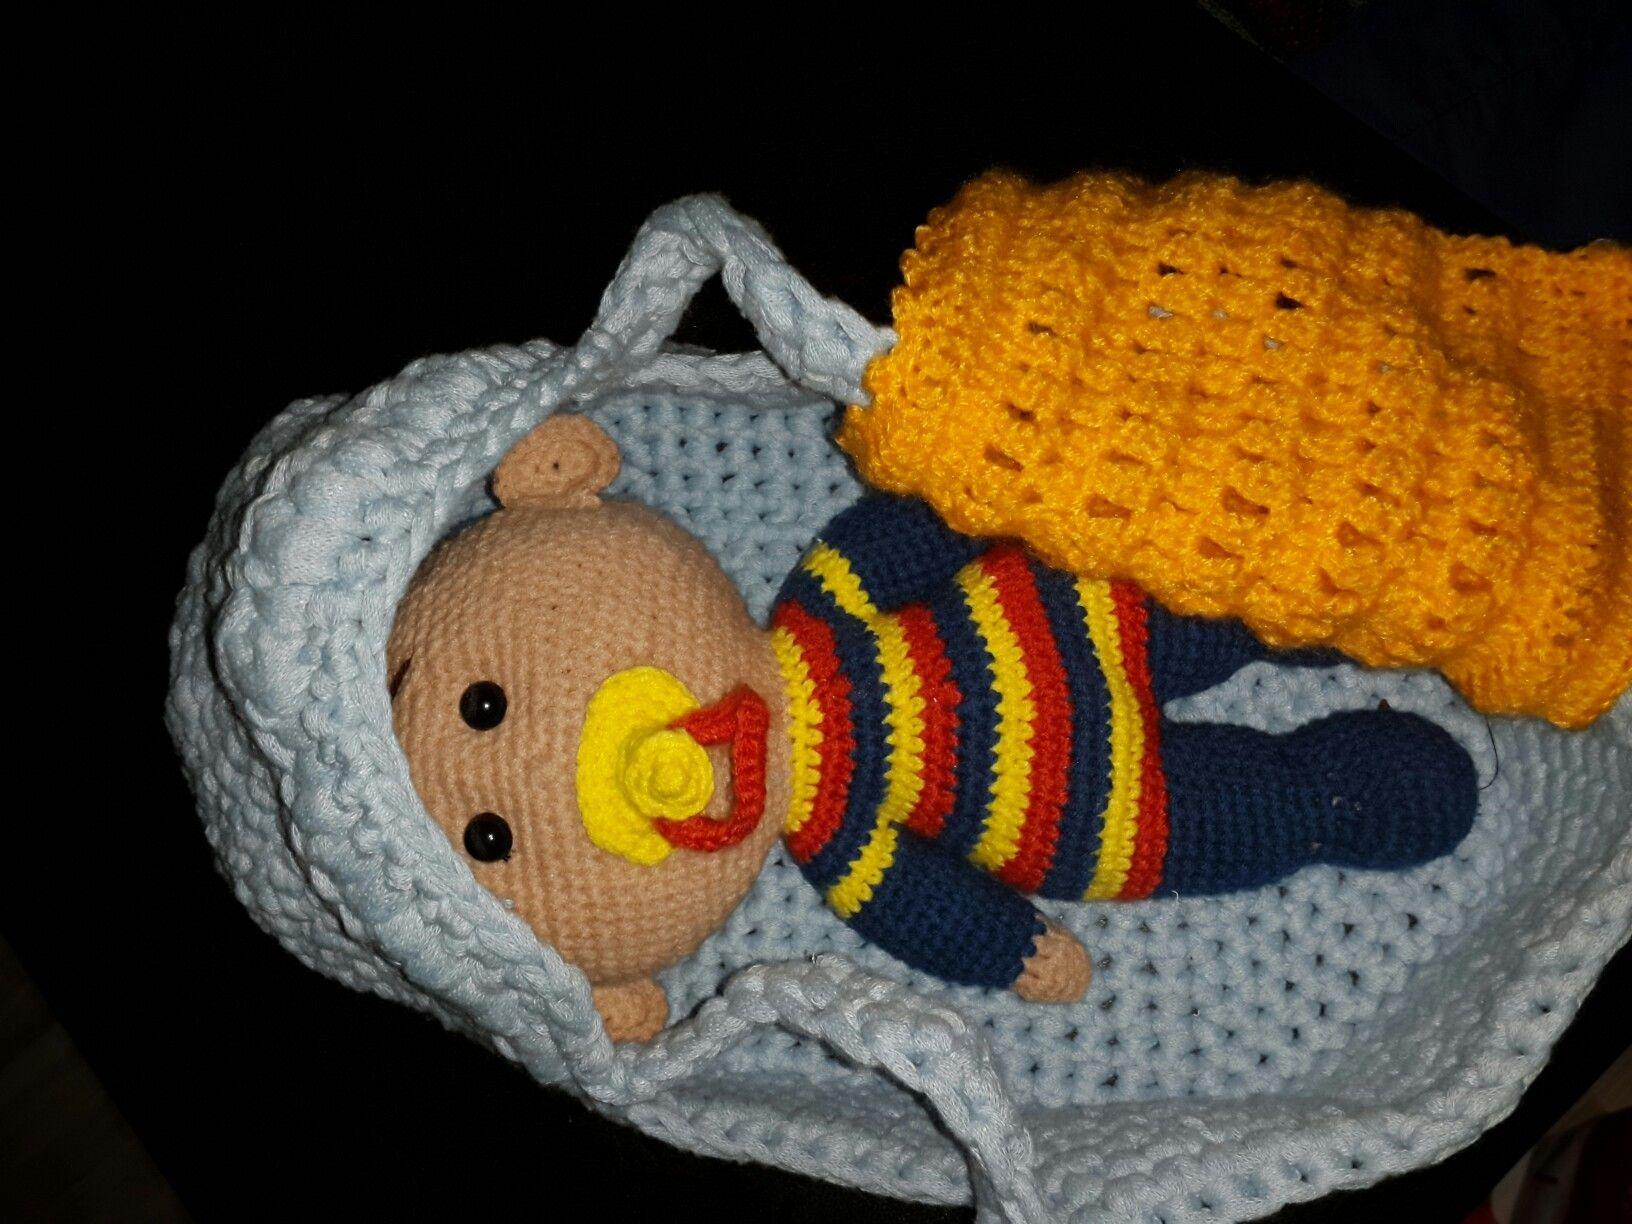 #Amigurumi #emziklibebek #AMİGURUMİ #Amigurumidoll #crochet #Alizecottongold #örgübebek #organikoyuncak